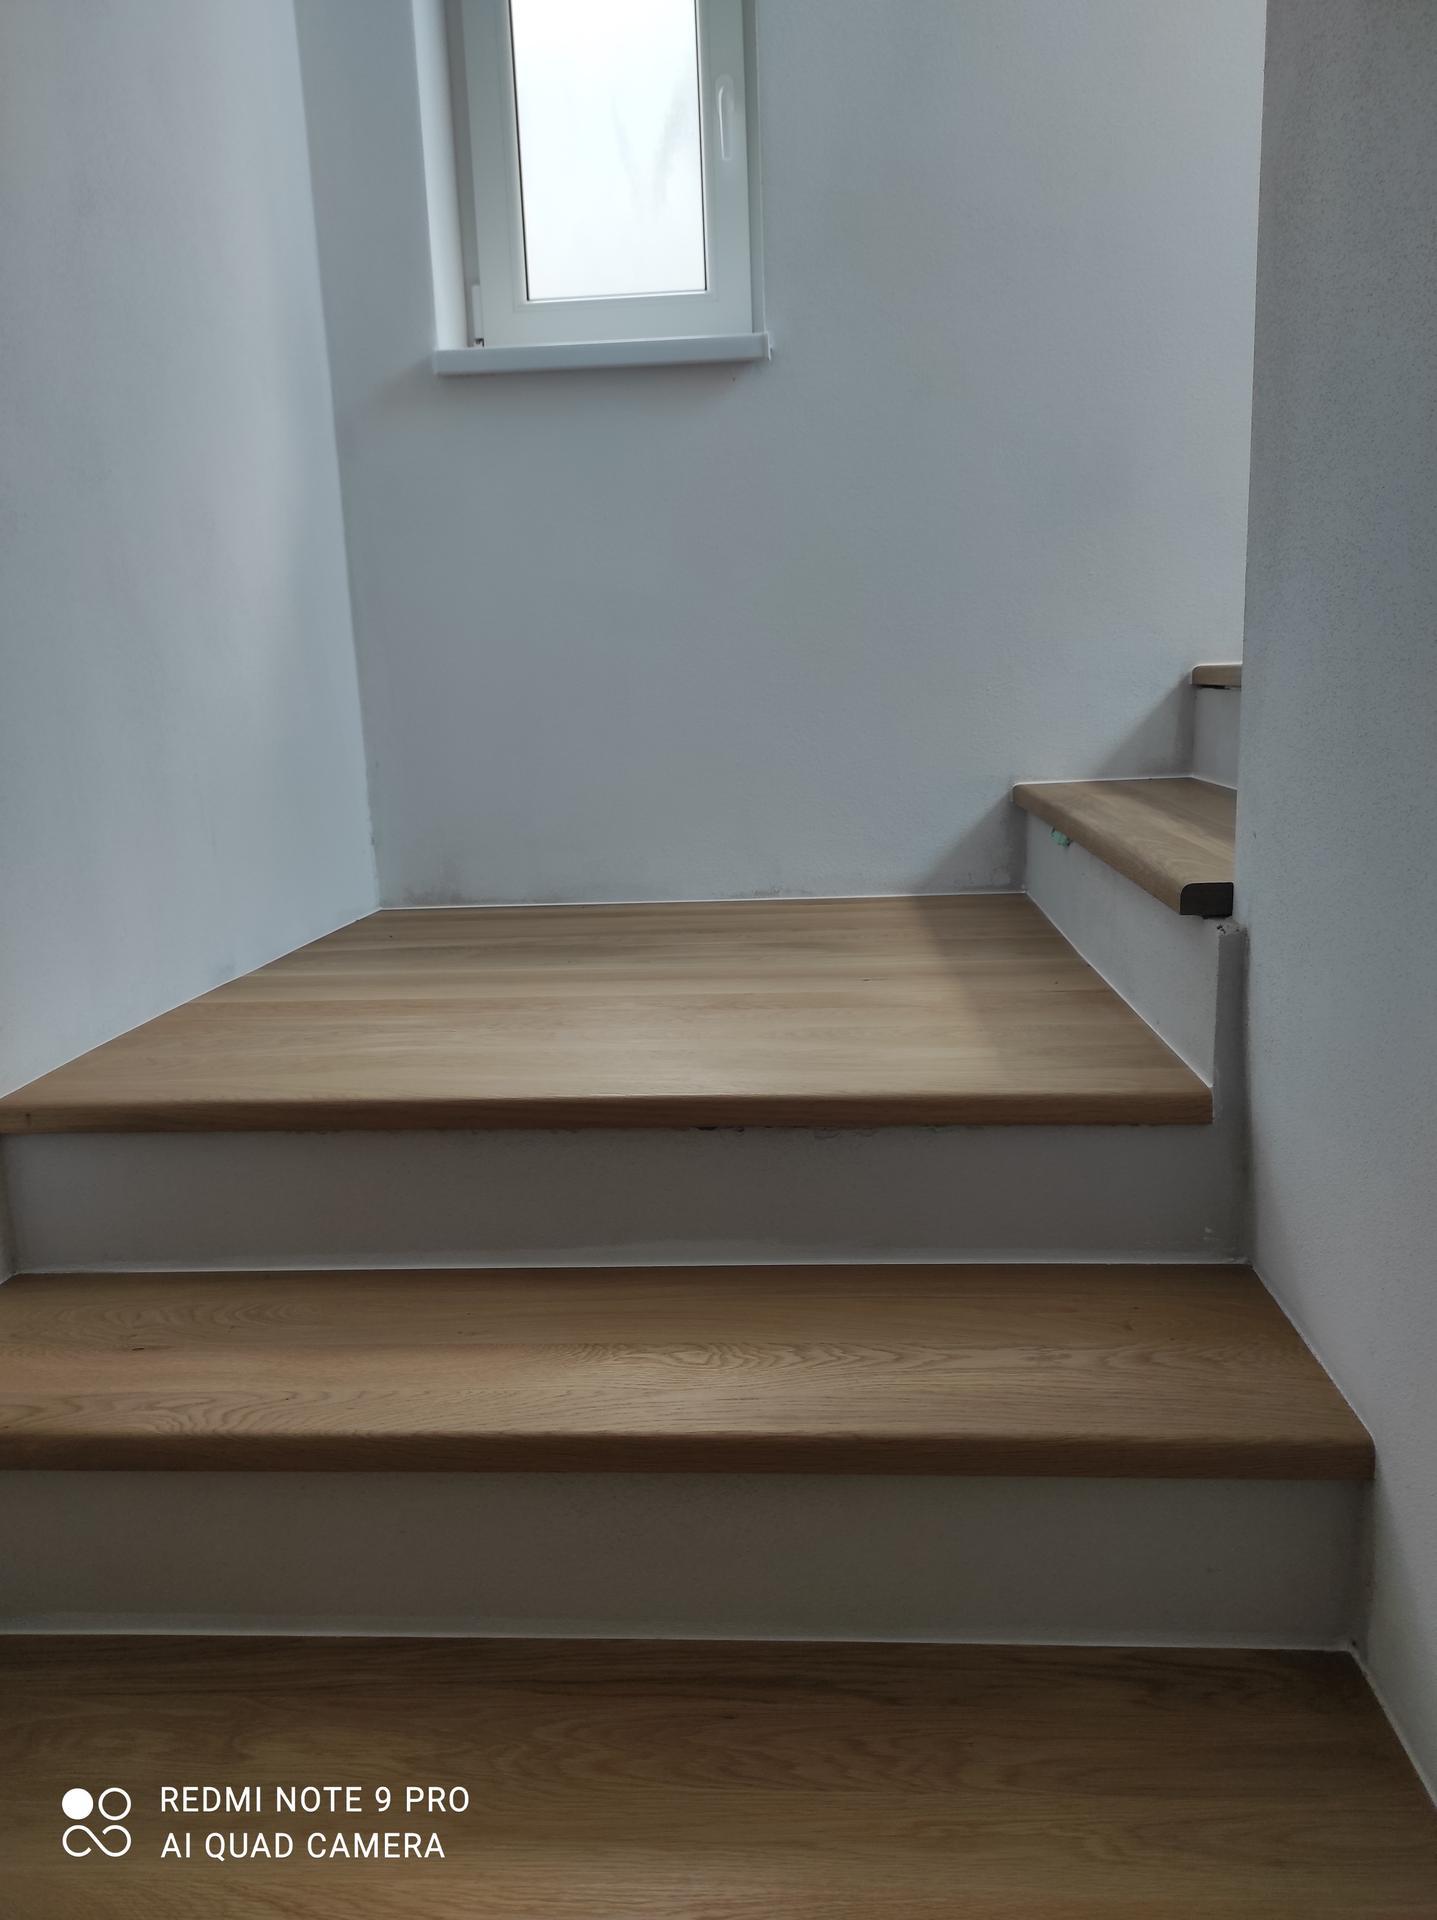 Takto nám dojezili schody... - Obrázok č. 2